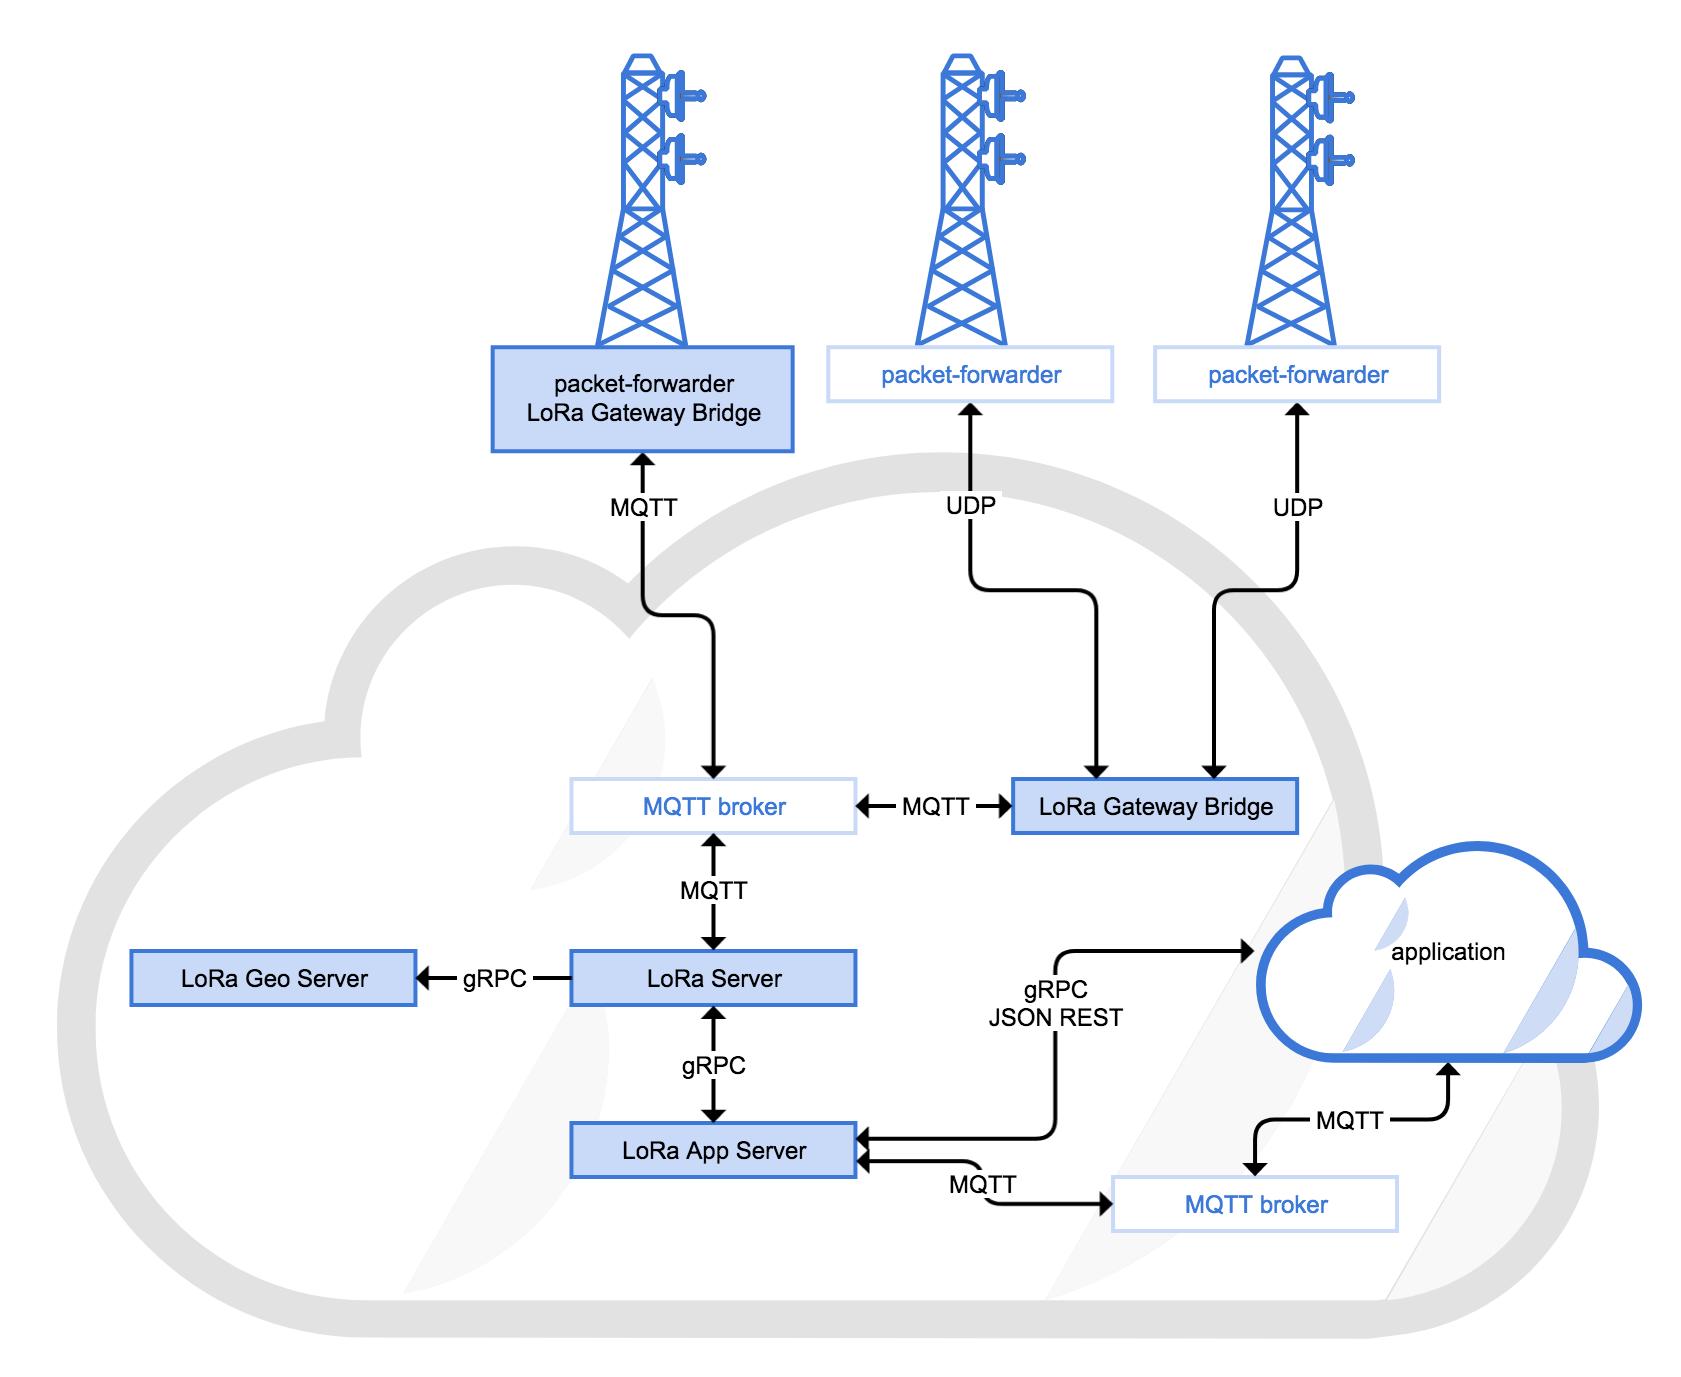 Making buildings intelligent using SAP Leonardo IoT and LoRaWAN